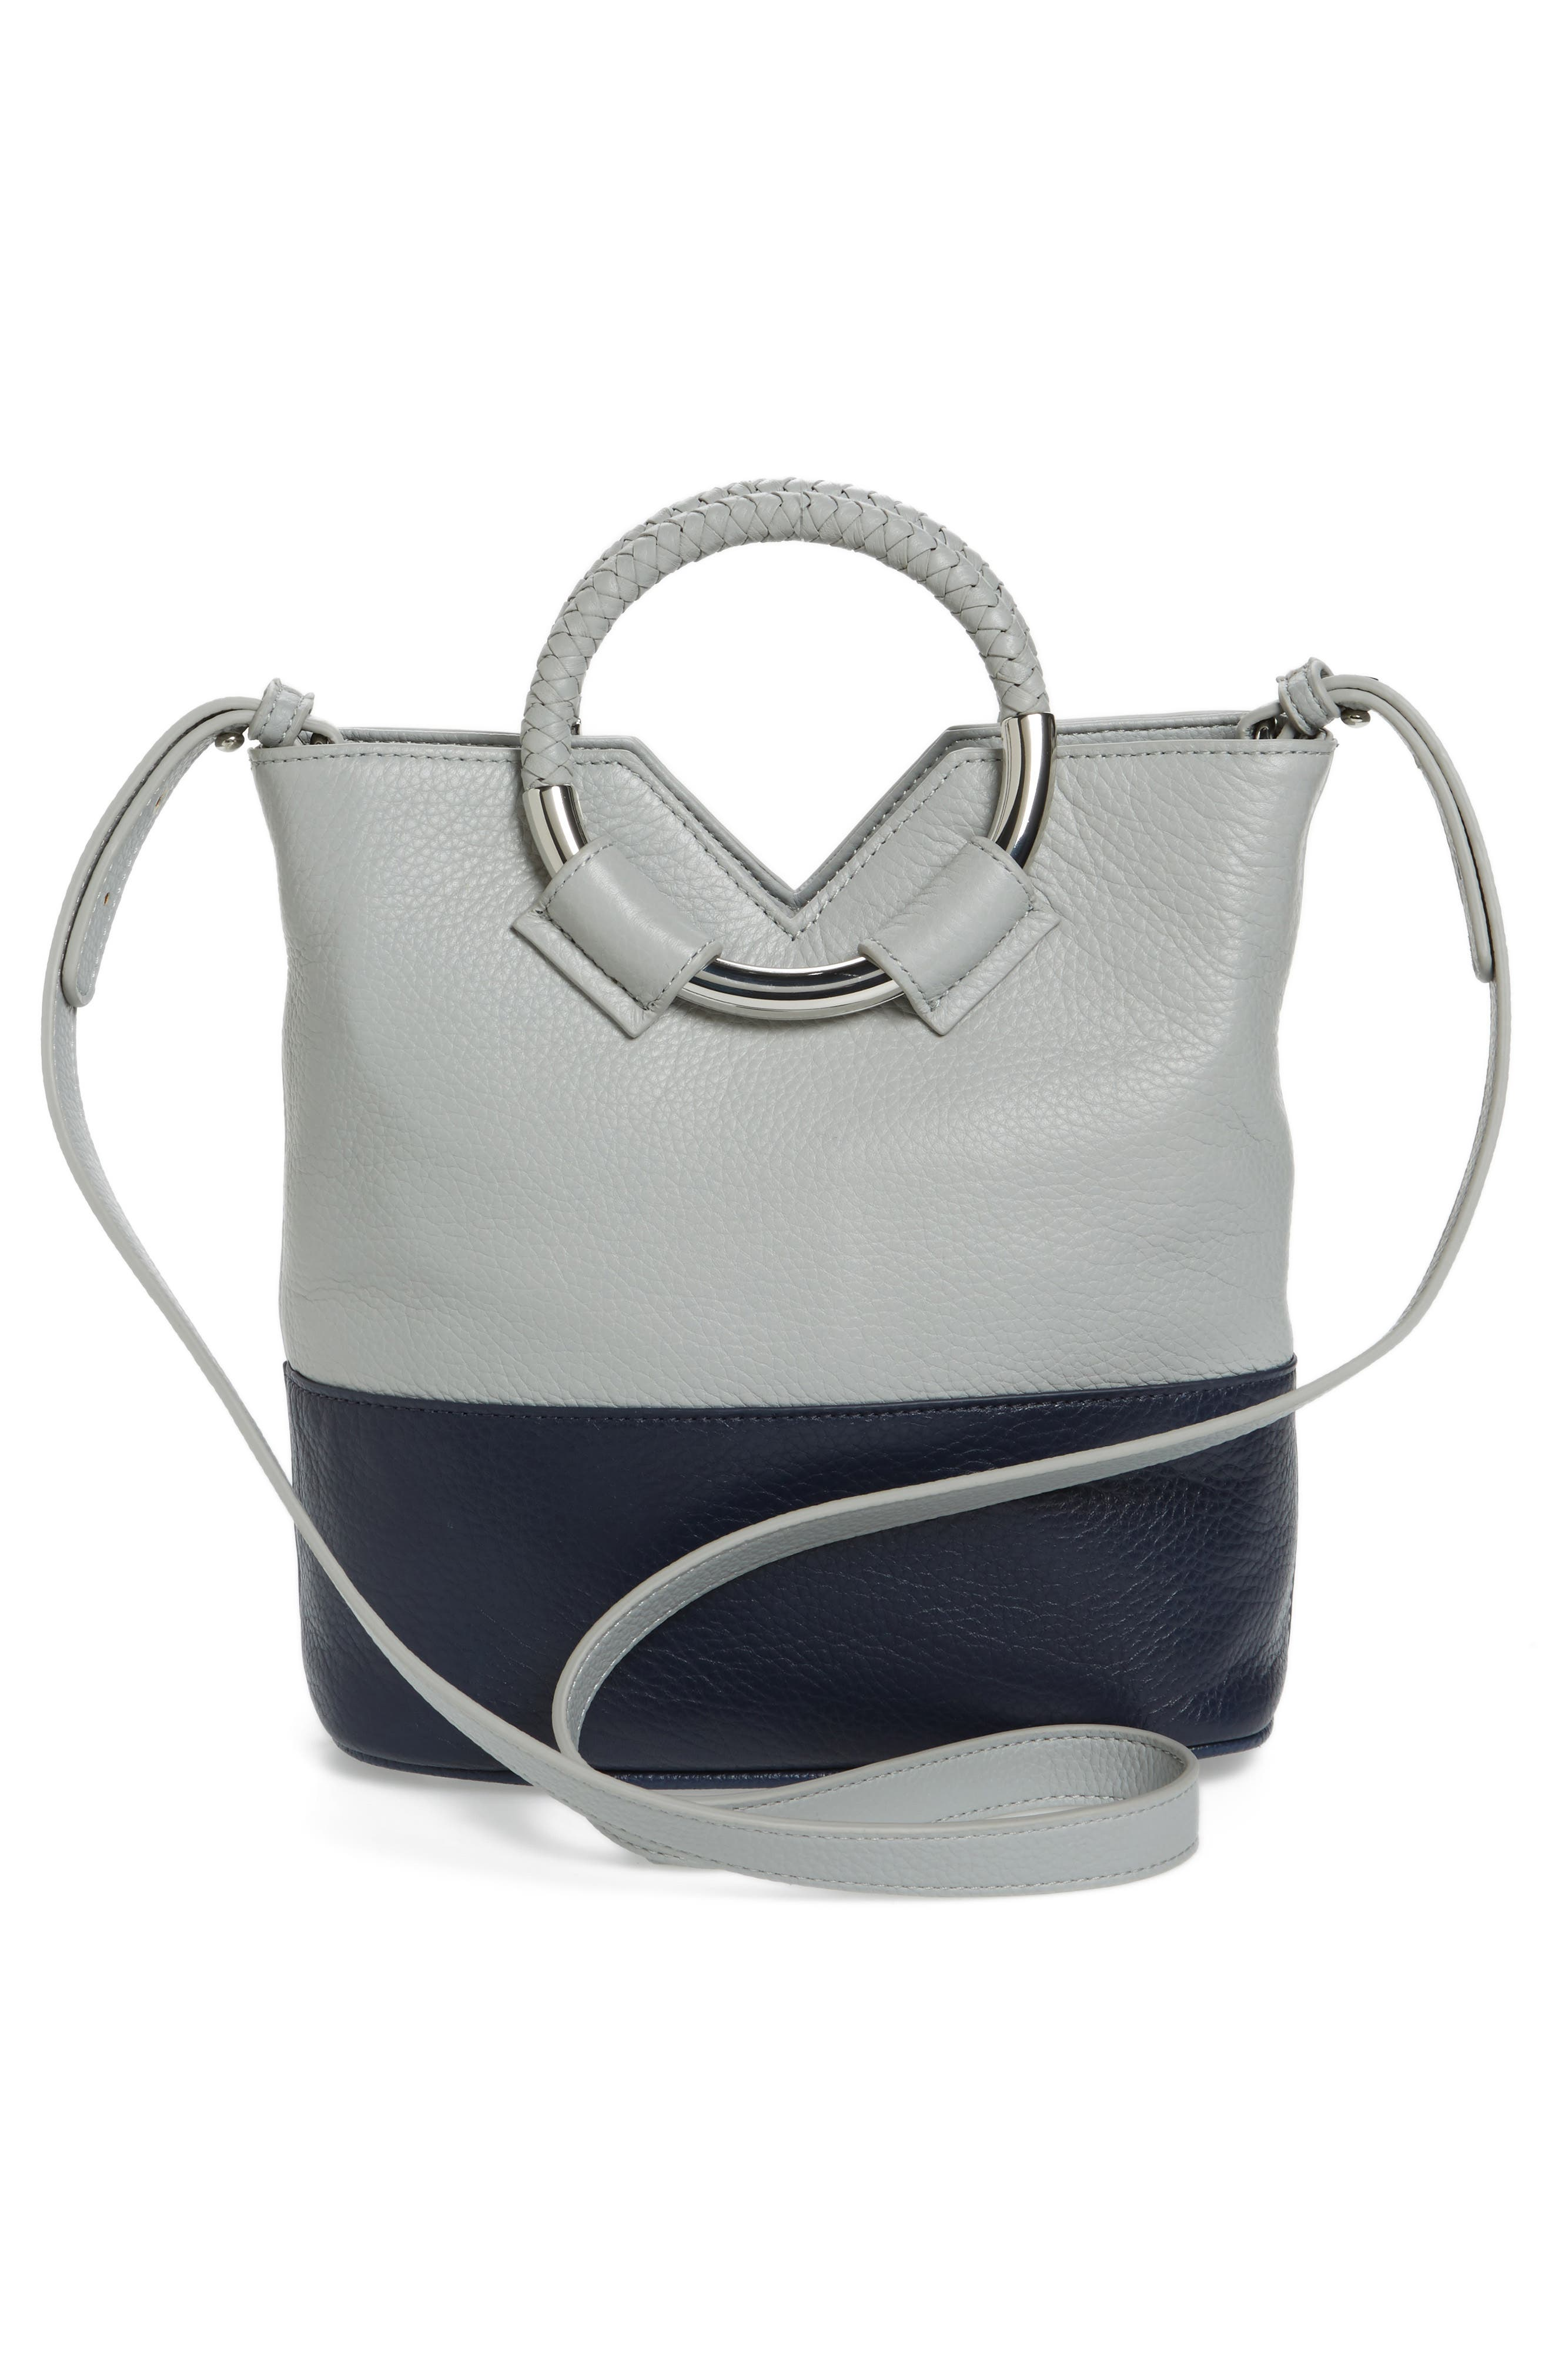 Small Elina Leather Crossbody Bag,                             Alternate thumbnail 3, color,                             Denim/ Ink Navy